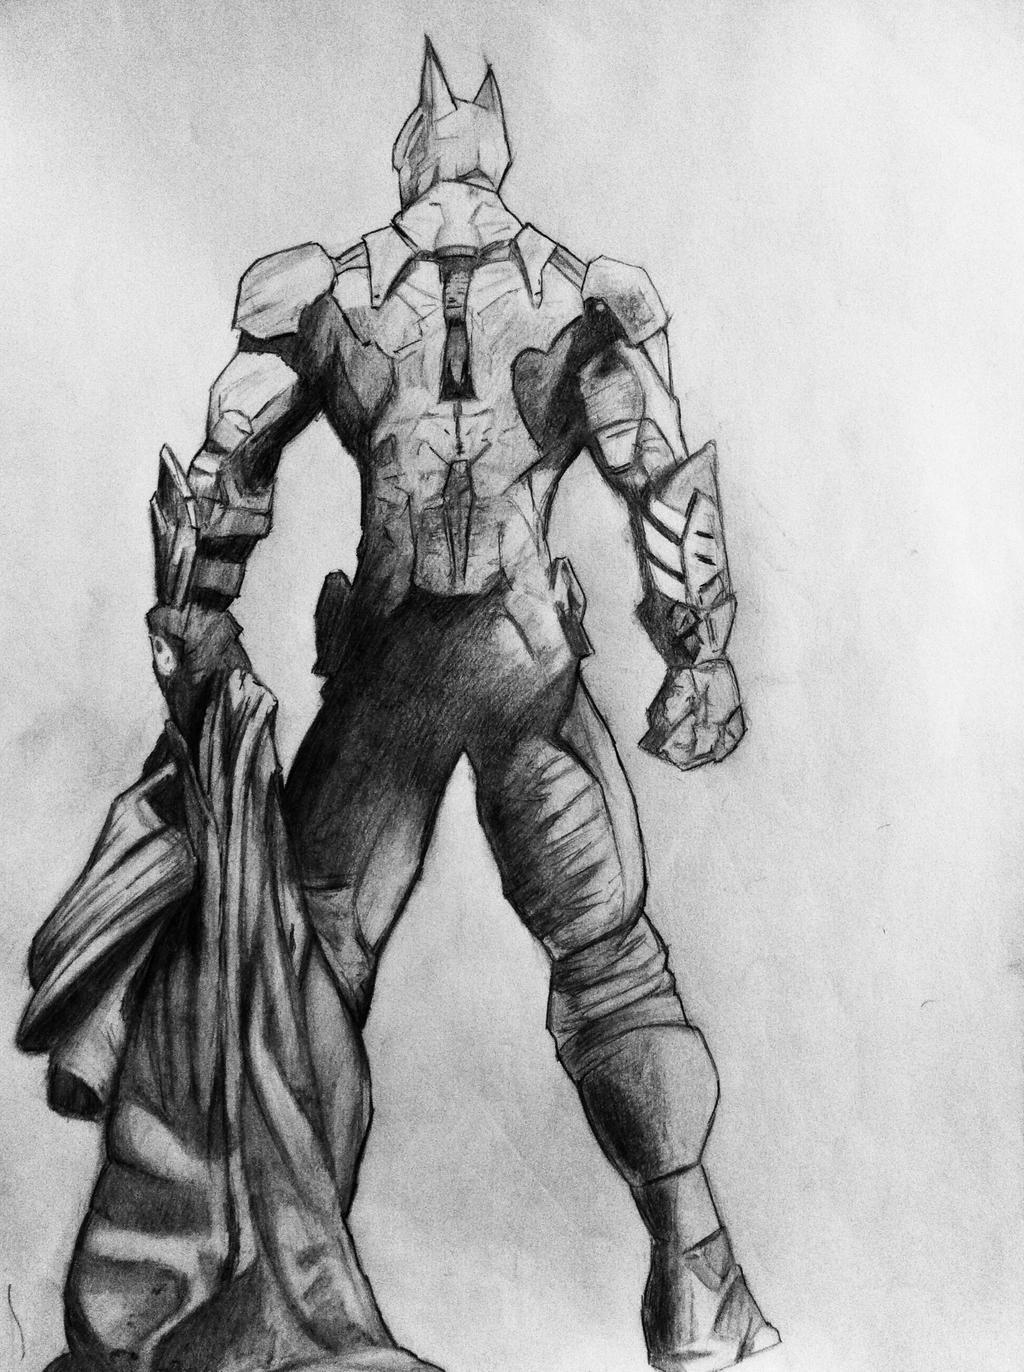 Batman Arkham Knight Drawing By DiegoE05 On DeviantArt